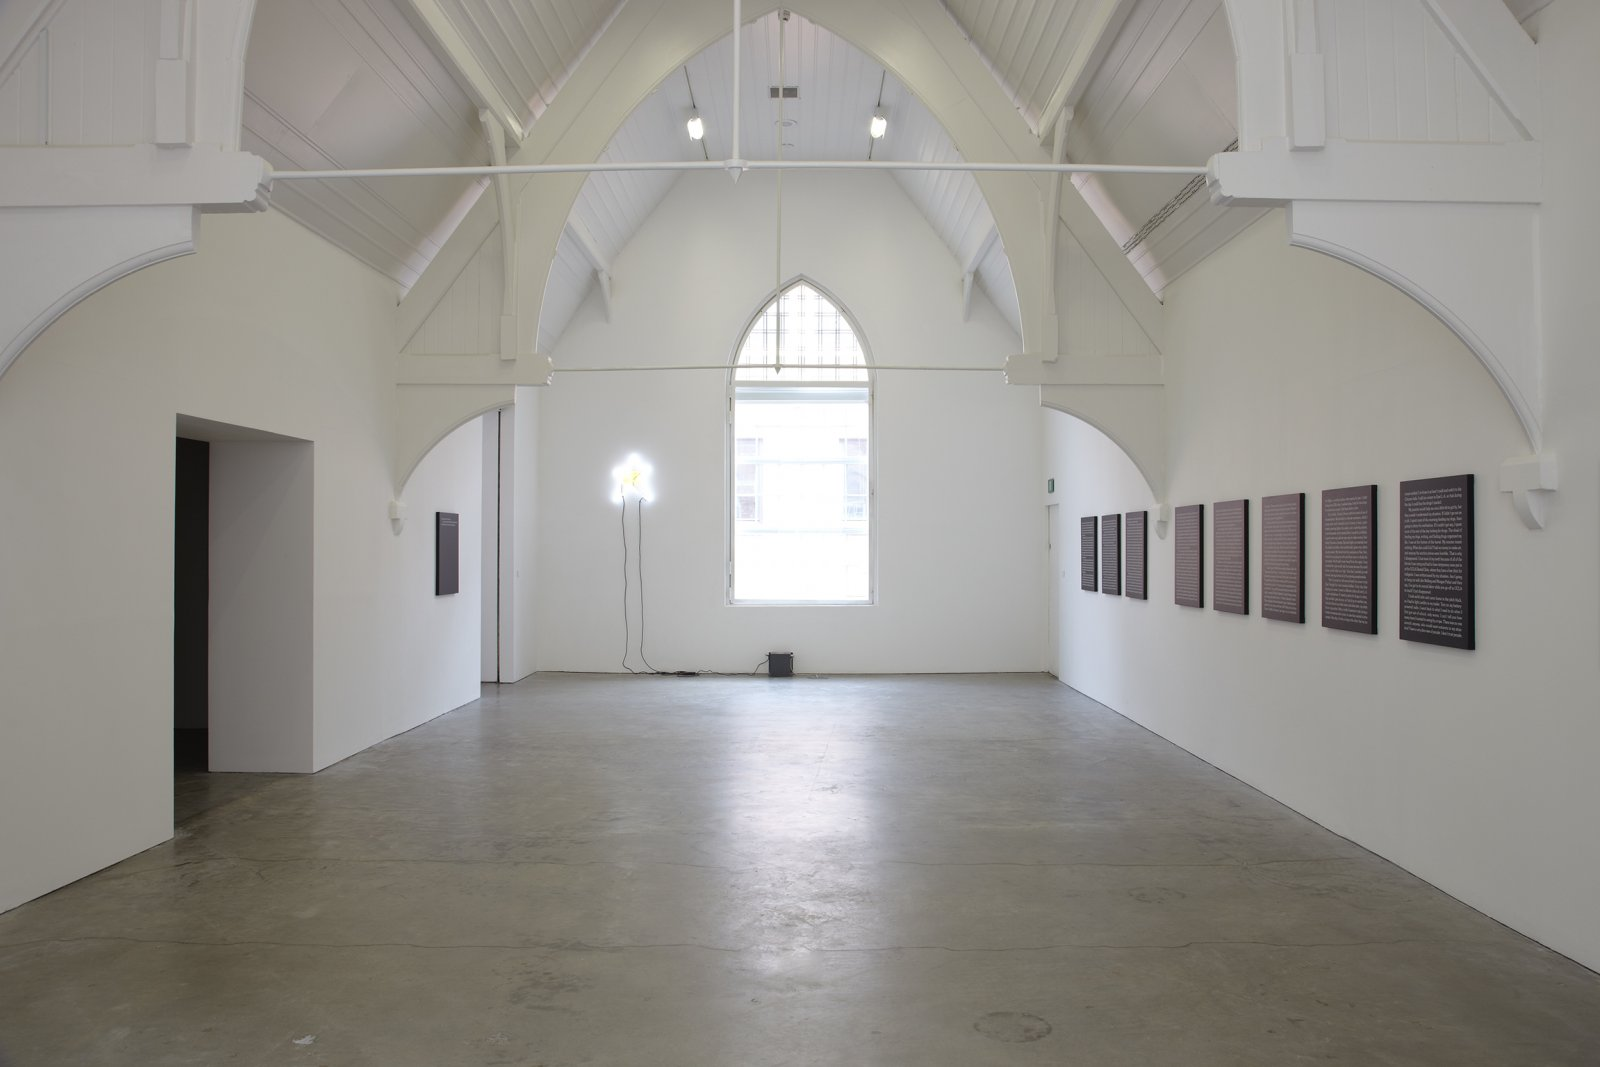 Ron Terada,Jack, 2010, acrylic on canvas, each 30 x 24 in. (76 x 61 cm). Installation view,Who I Think I Am, Ikon Gallery, Birmingham, UK, 2010